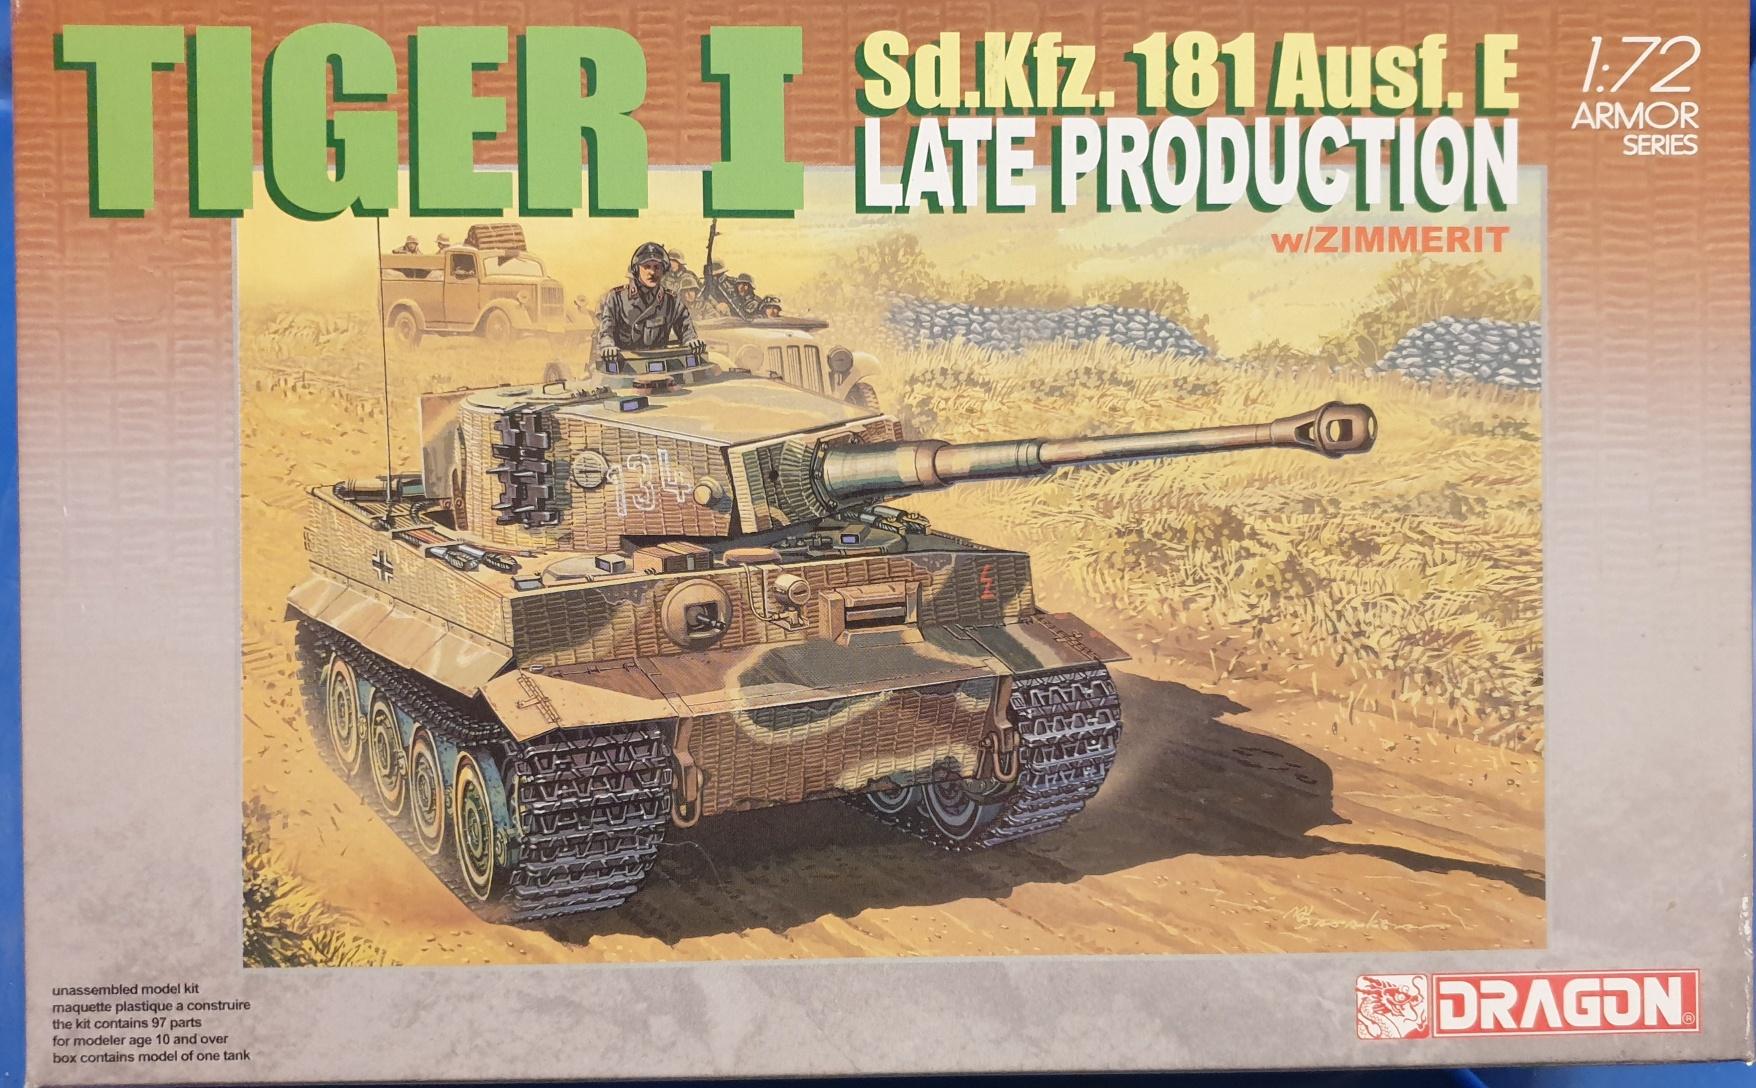 3 Dragon 7203 Tiger I Sd.Kfz. 181 Ausf. E Late Prod. 1/72